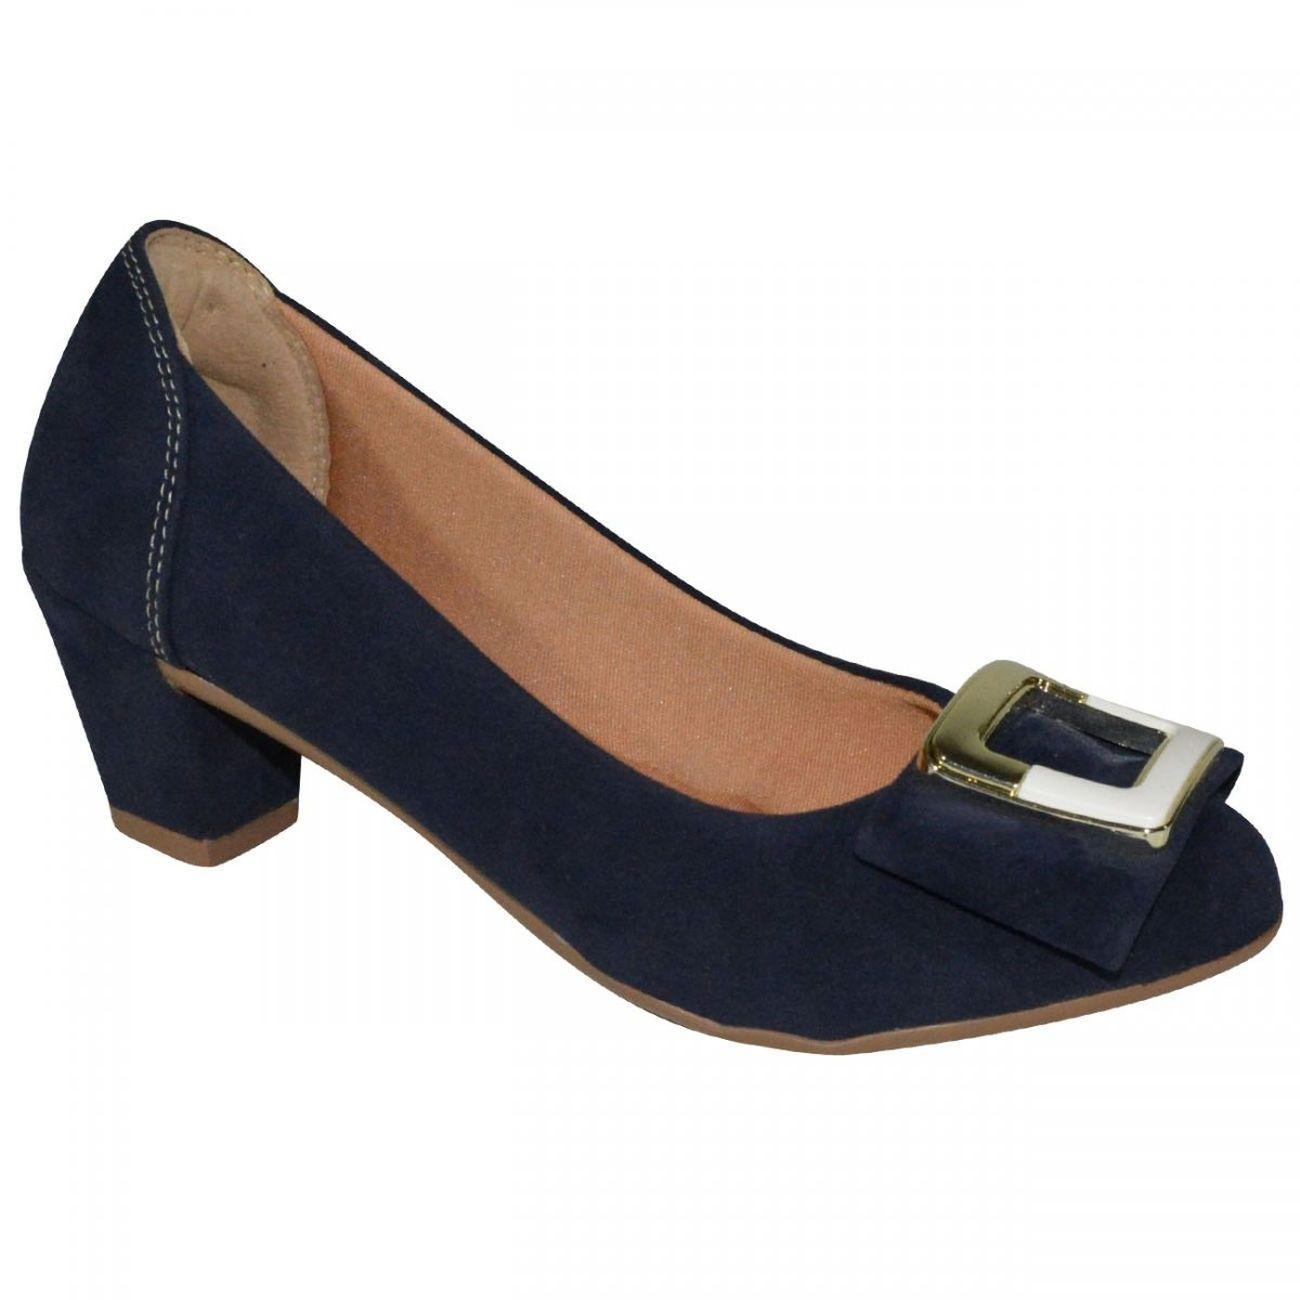 9f3b96837 Sapato Exclusiva - Marinho   Sapatos   Shoes, Heels e Peep toe